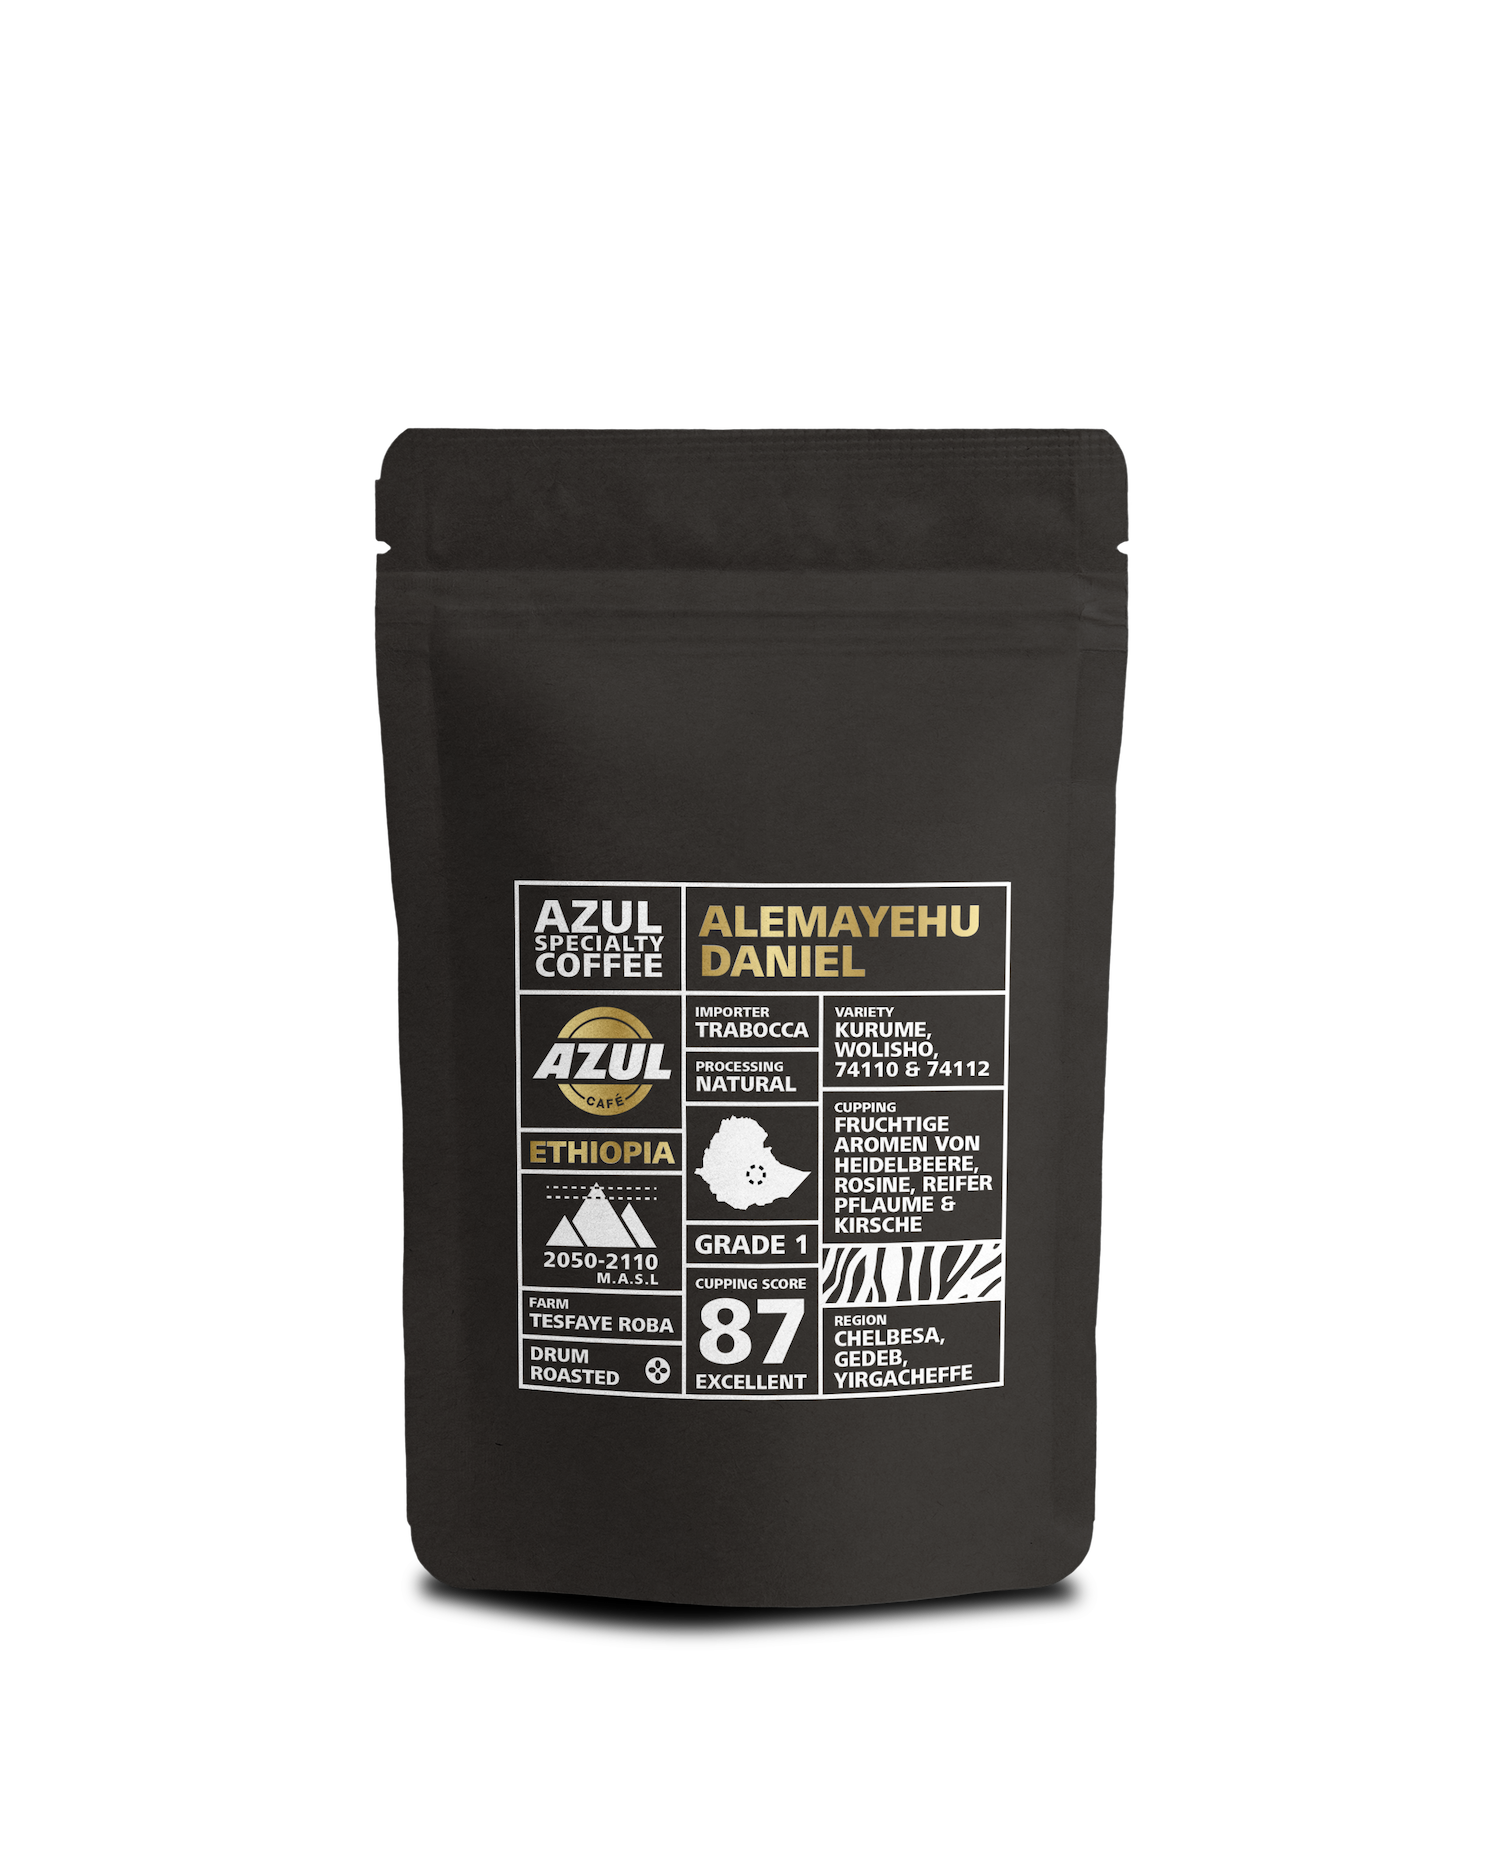 Azul Kaffee – Specialty Coffee Ethiopoa Alemayehu Daniel